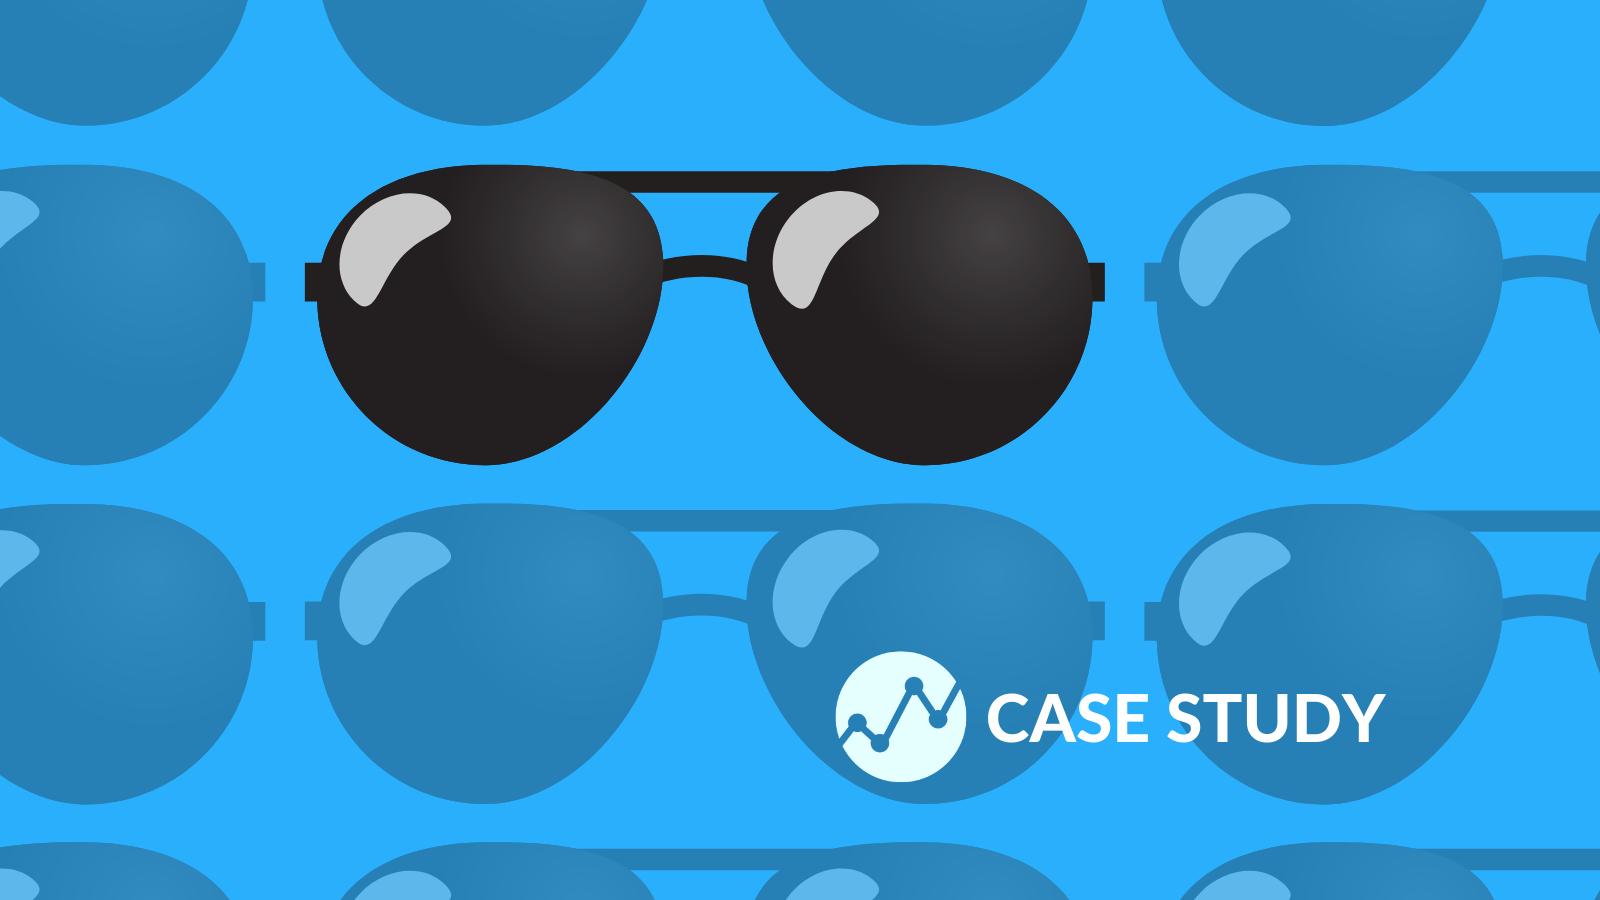 Global Eyewear Leader Case Study: Custom Dashboards